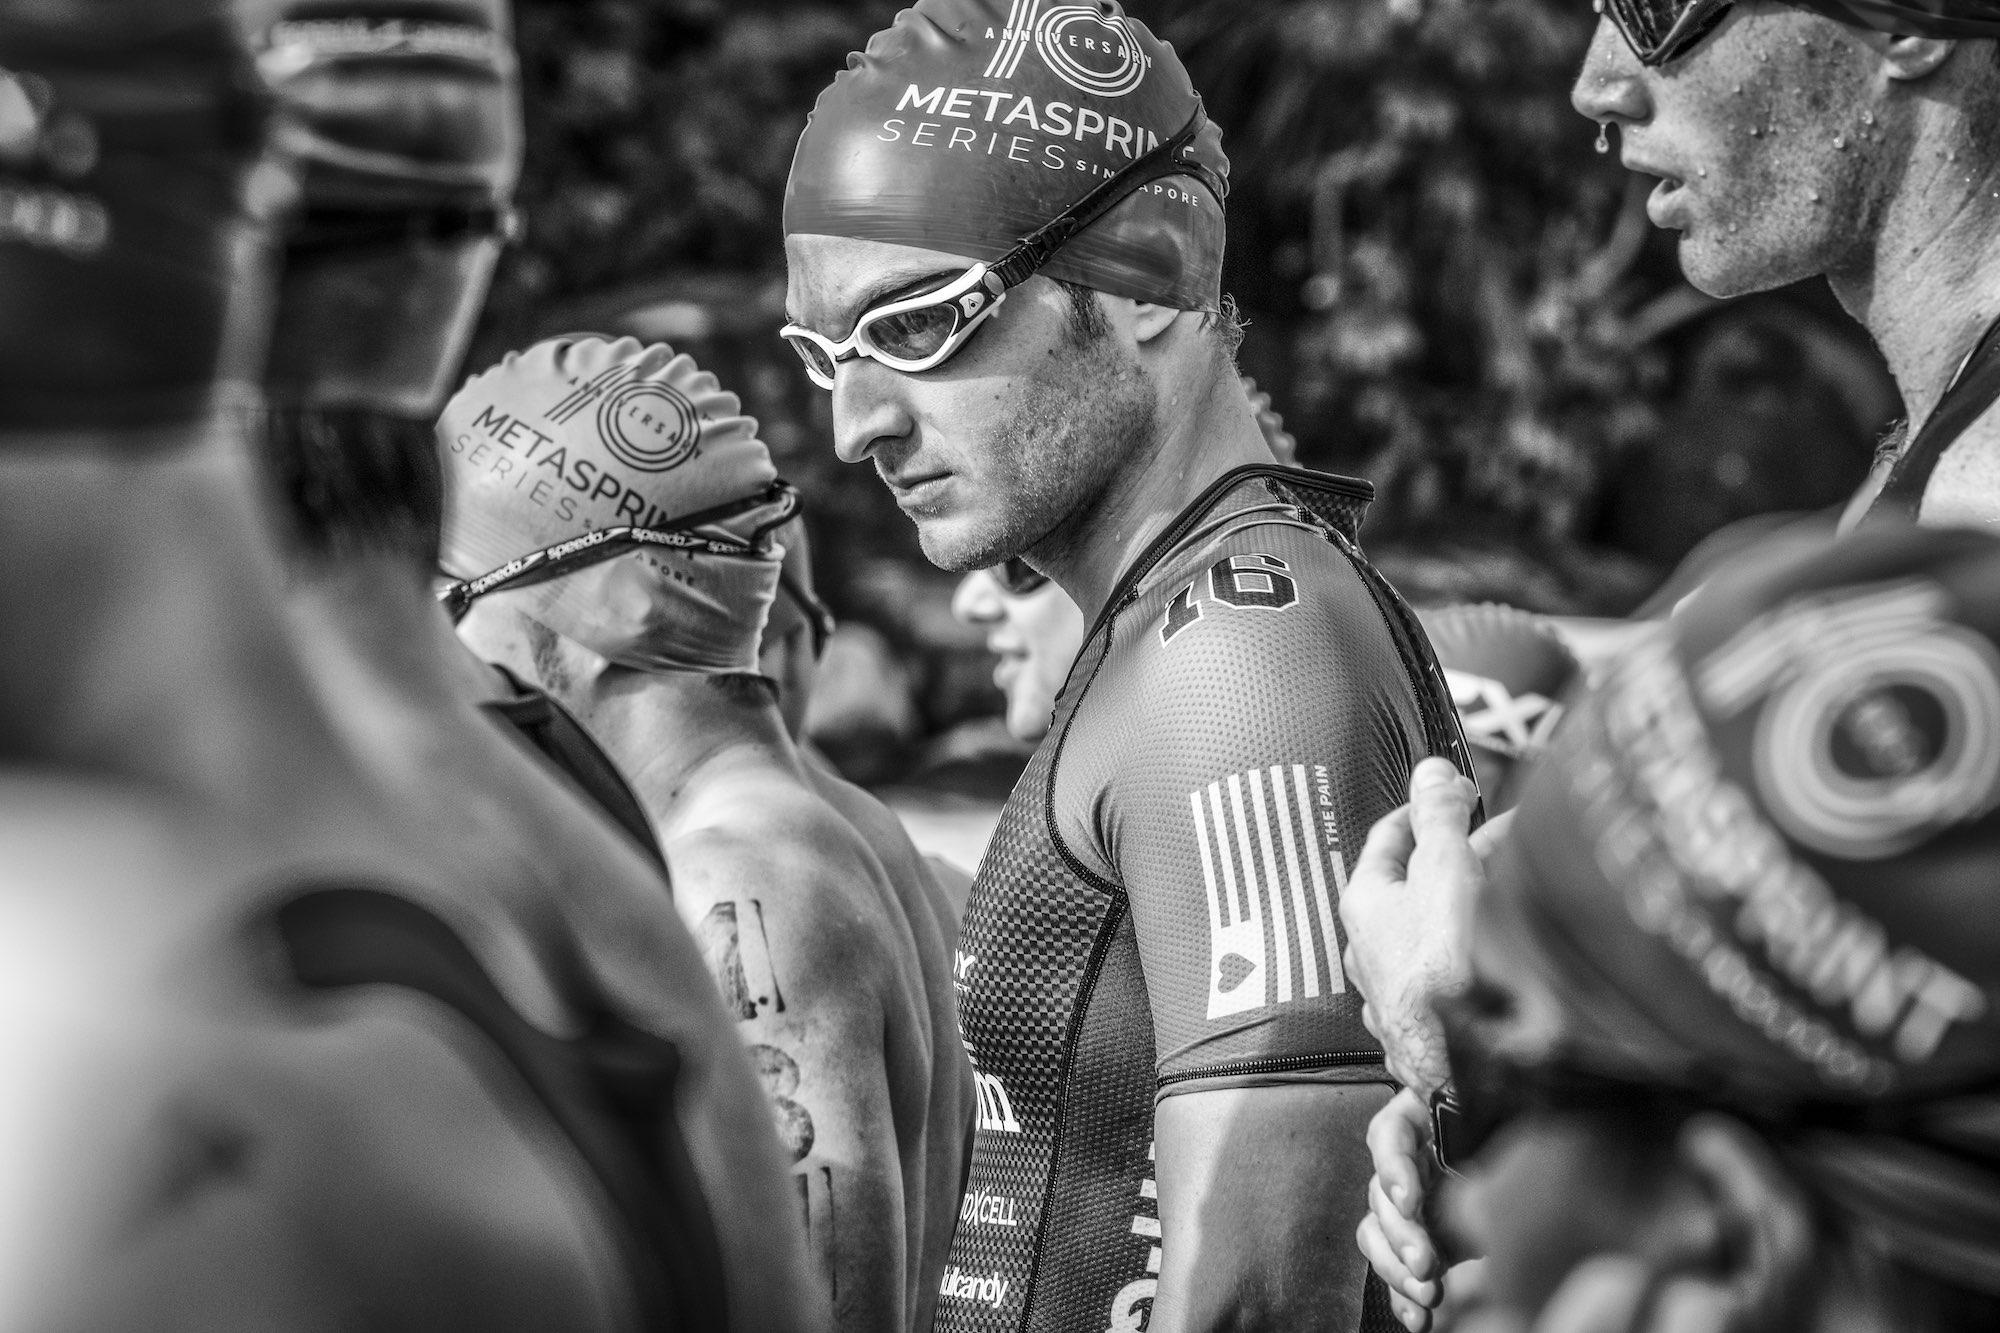 Corporate photography sport events race competition Sinagpore sg photographer triathlon triathlete athlete 5